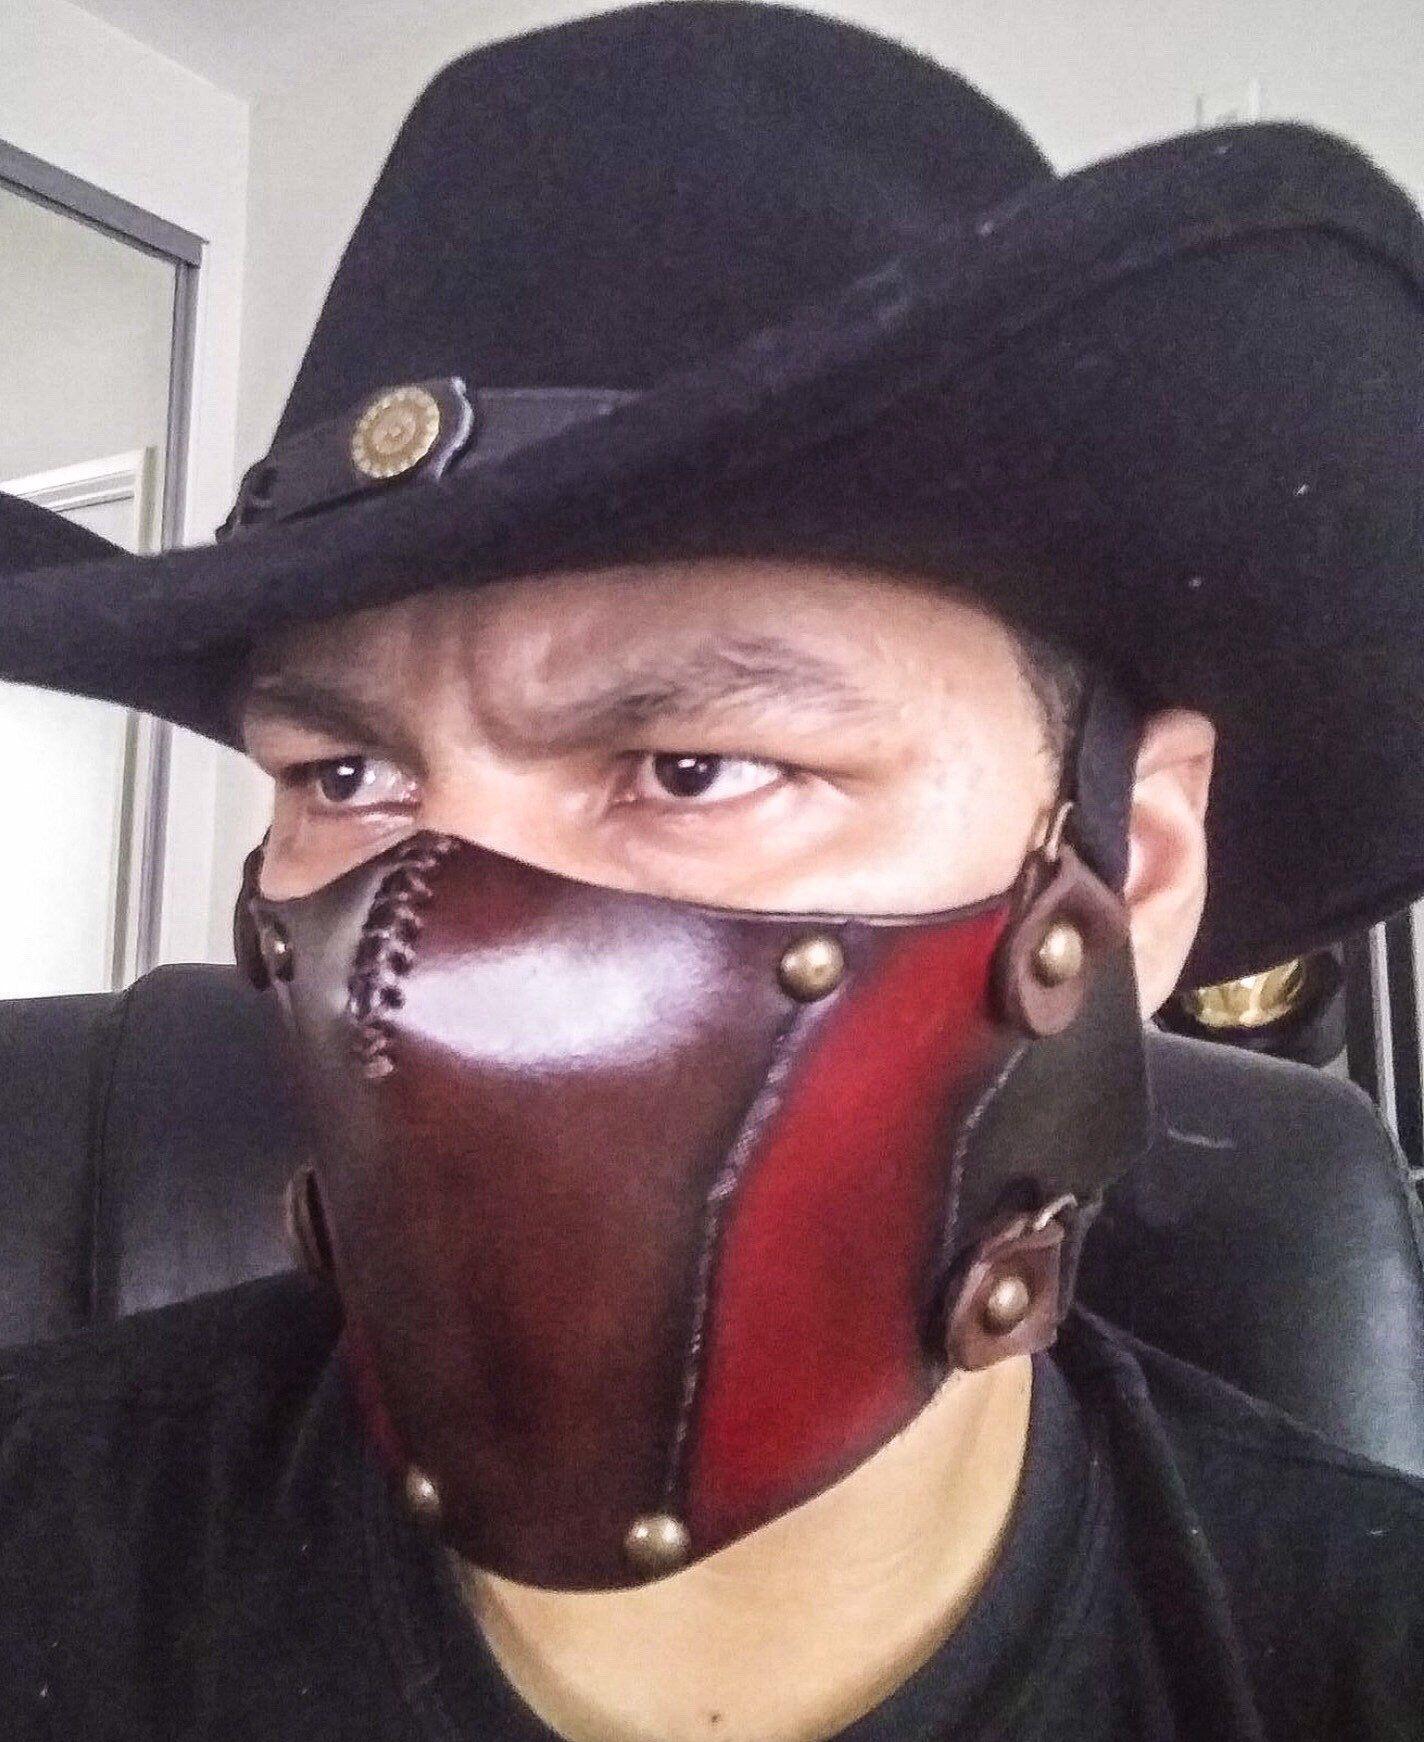 Erron Black Mask Mortal Kombat Mask Cosplay Costume Video Etsy